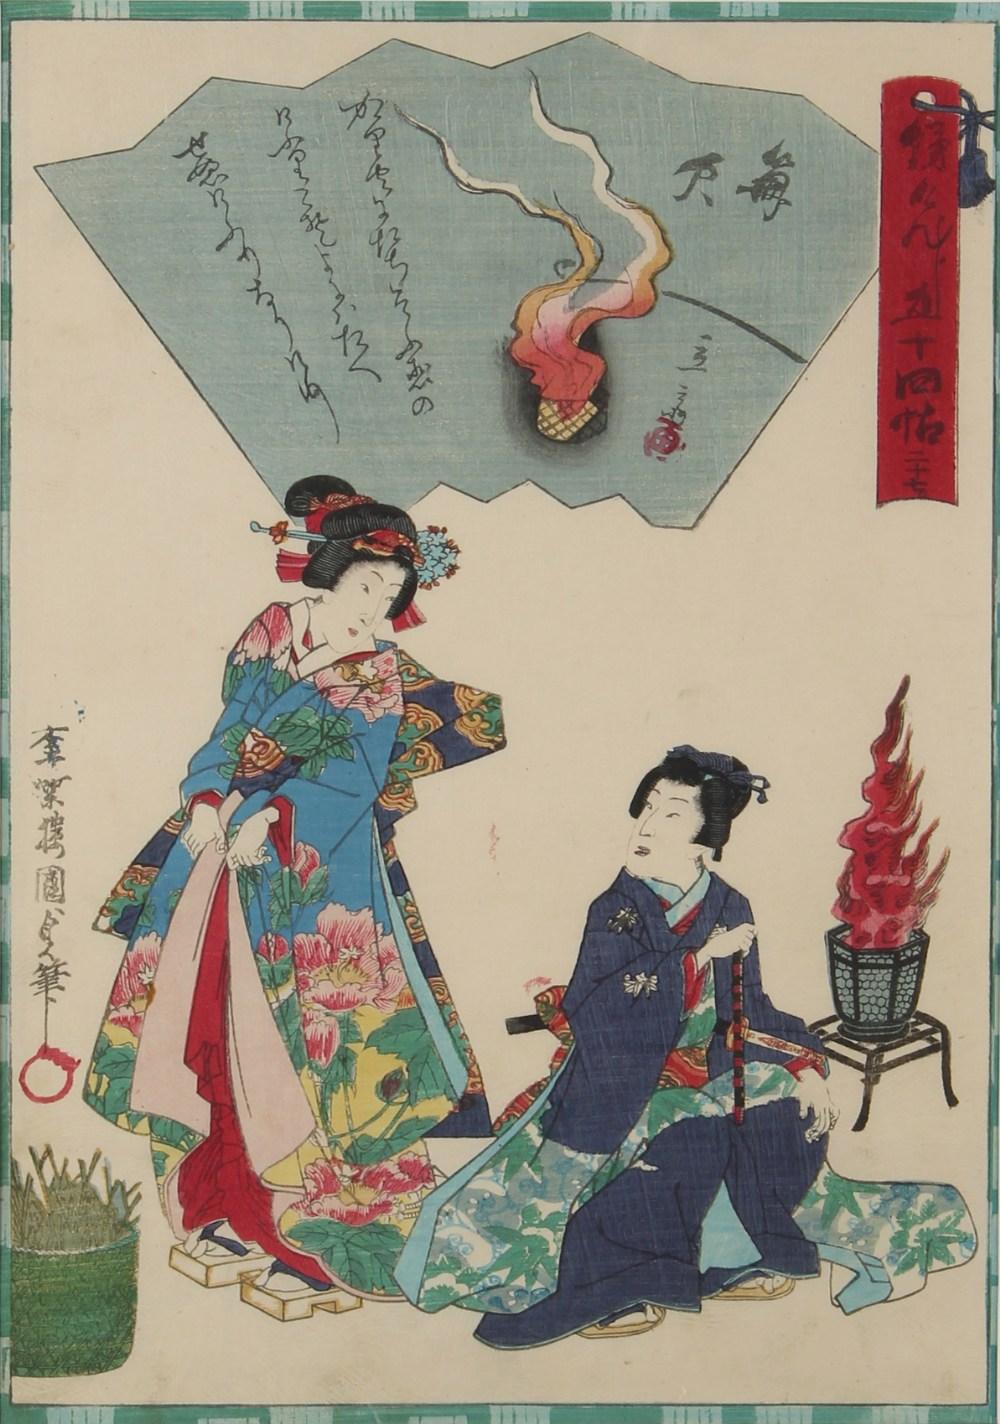 A collection of Japanese woodblock prints - Toyokuni IV Utagawa (1823-1880) - Kagaribi (Flares),